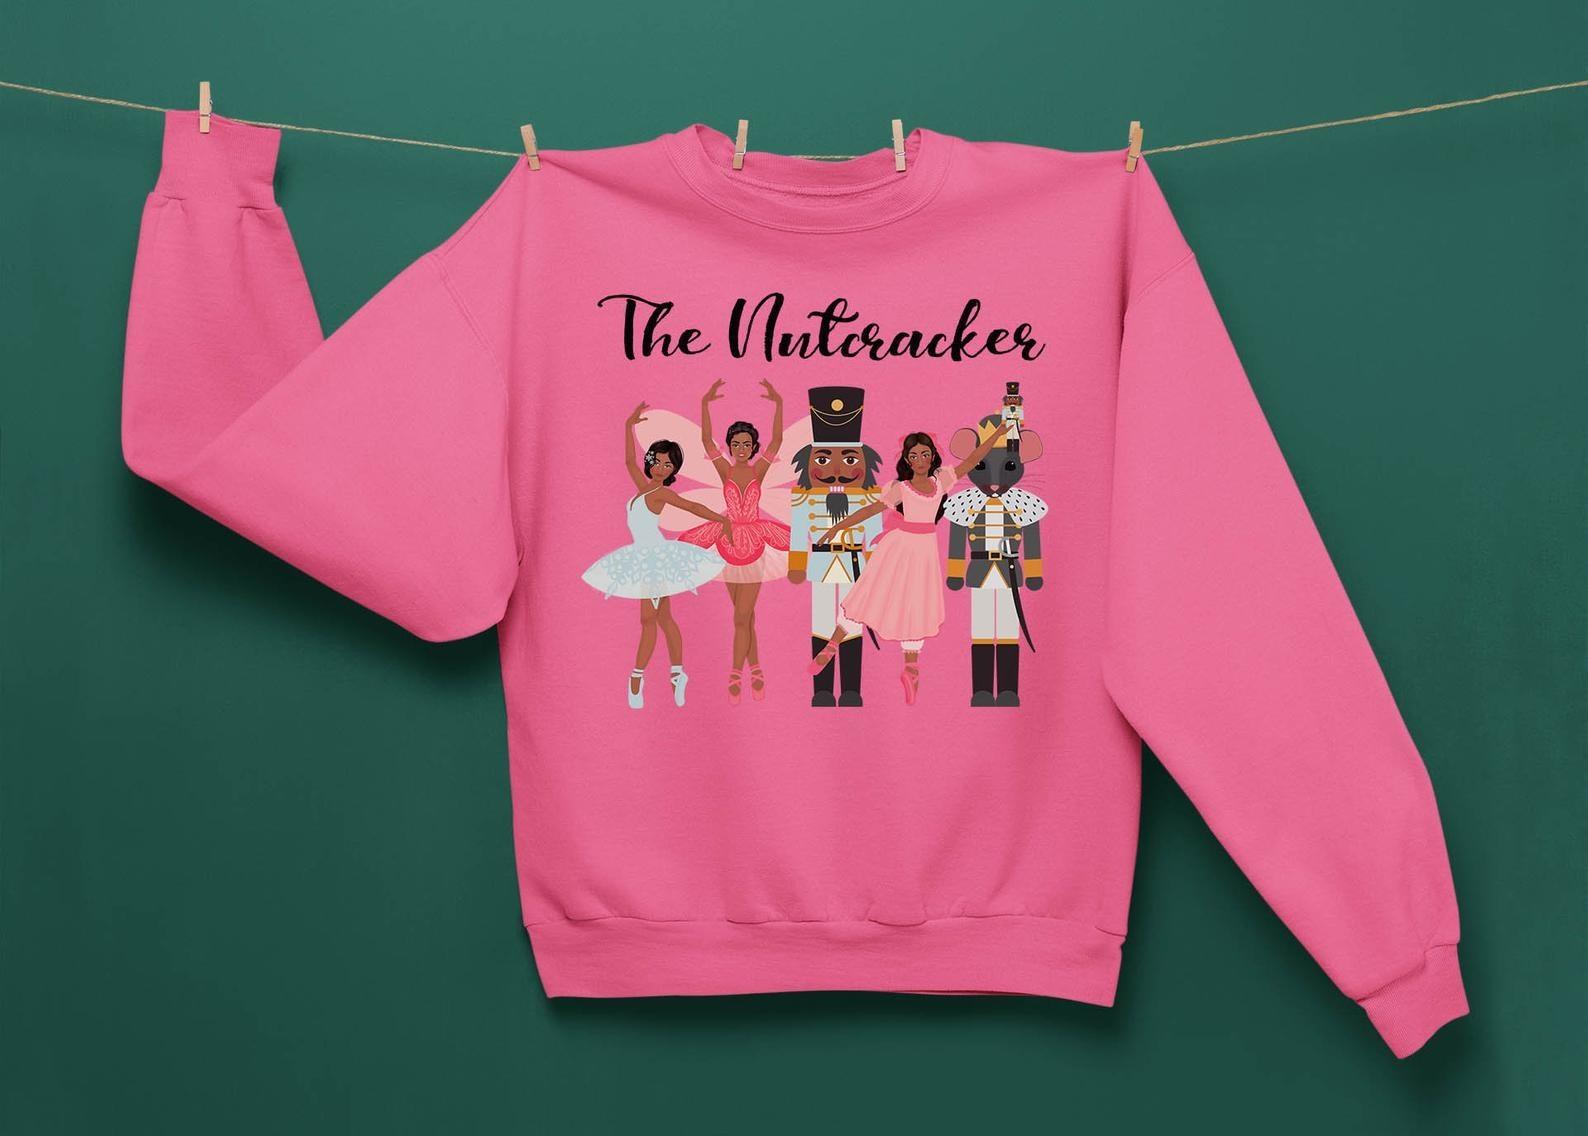 a pink sweatshirt with the nutcracker characters on it in dark skintones